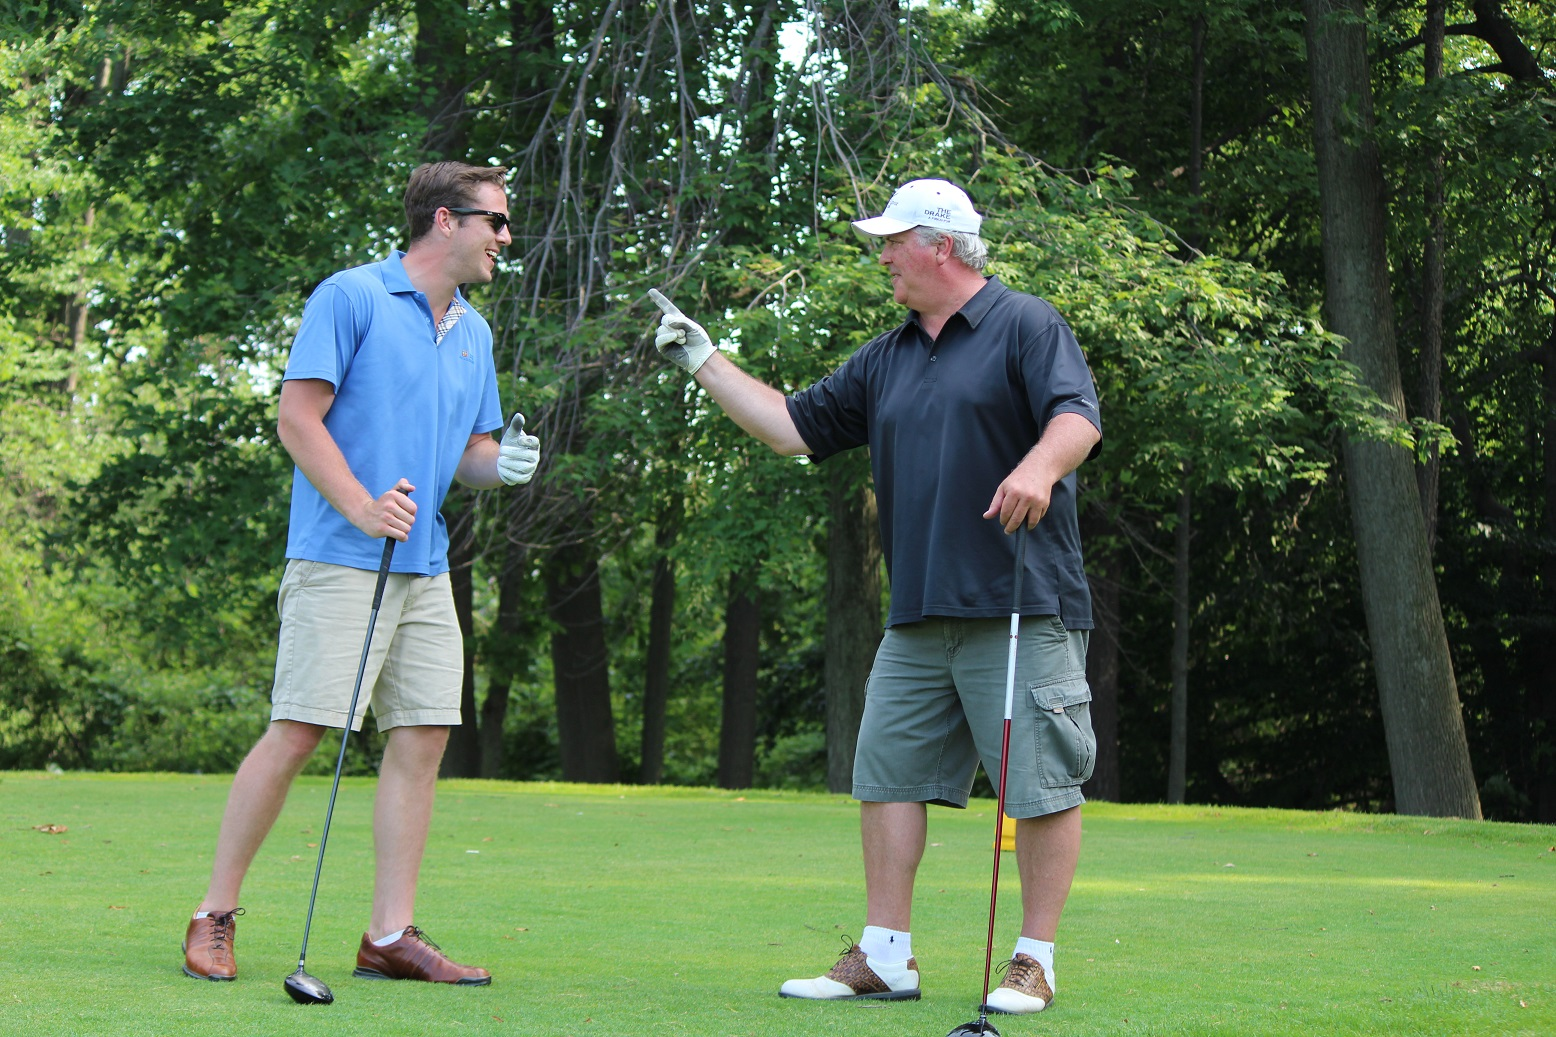 EddieO's Golf guests 49.jpg